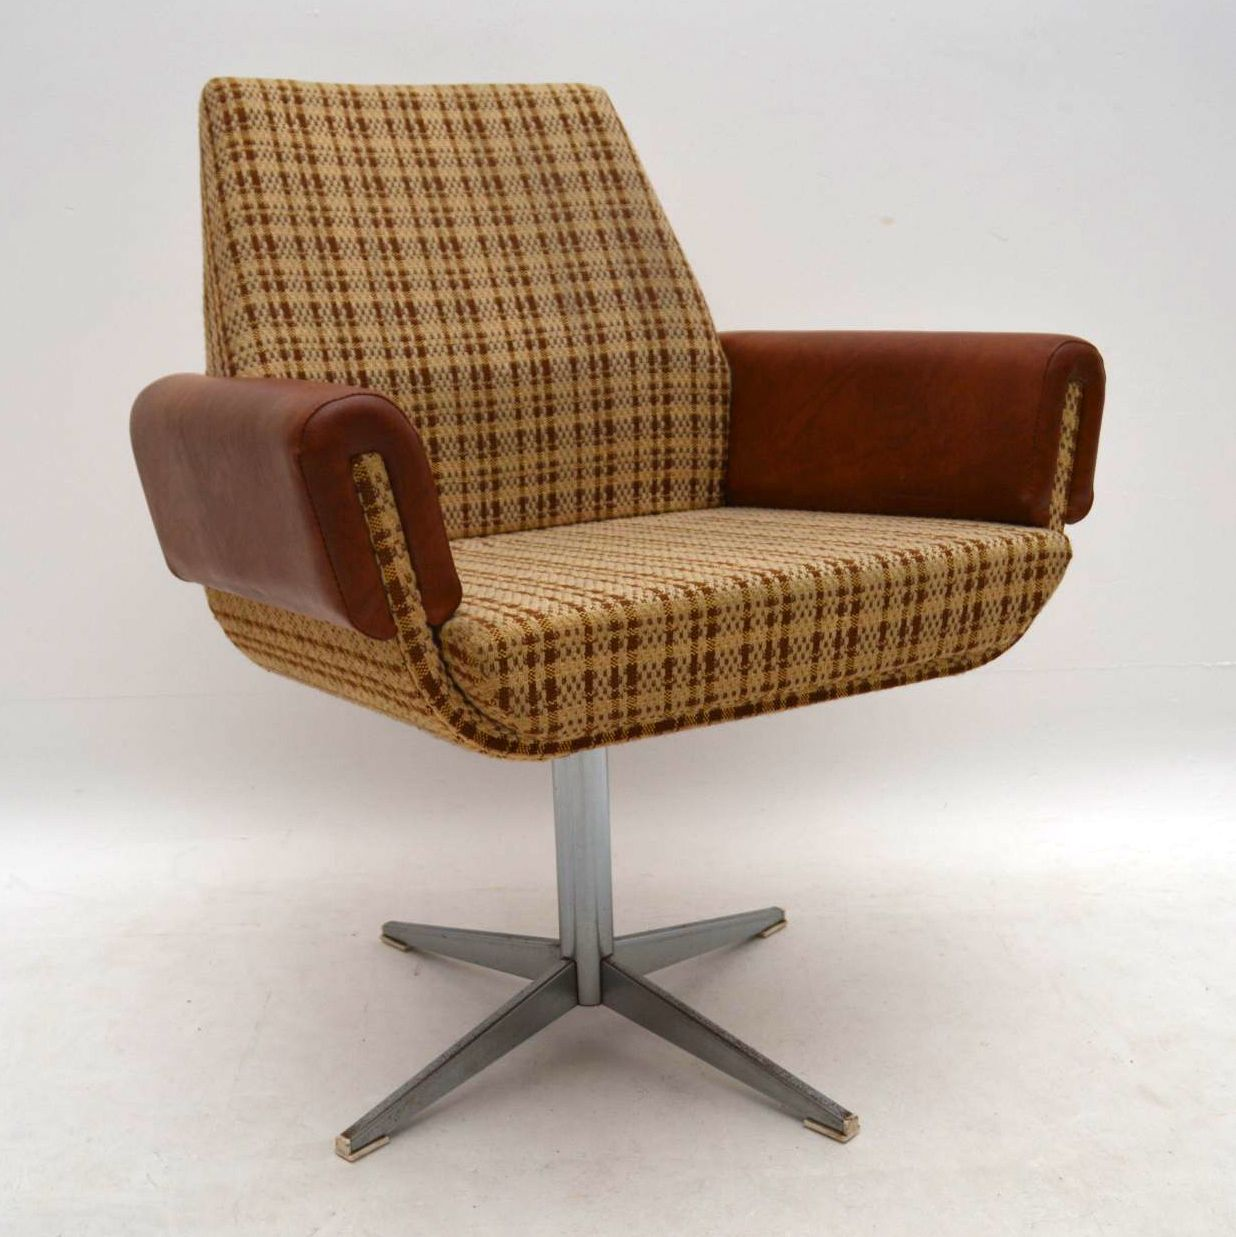 1960's Vintage Swivel Desk Chair | Retrospective Interiors ...